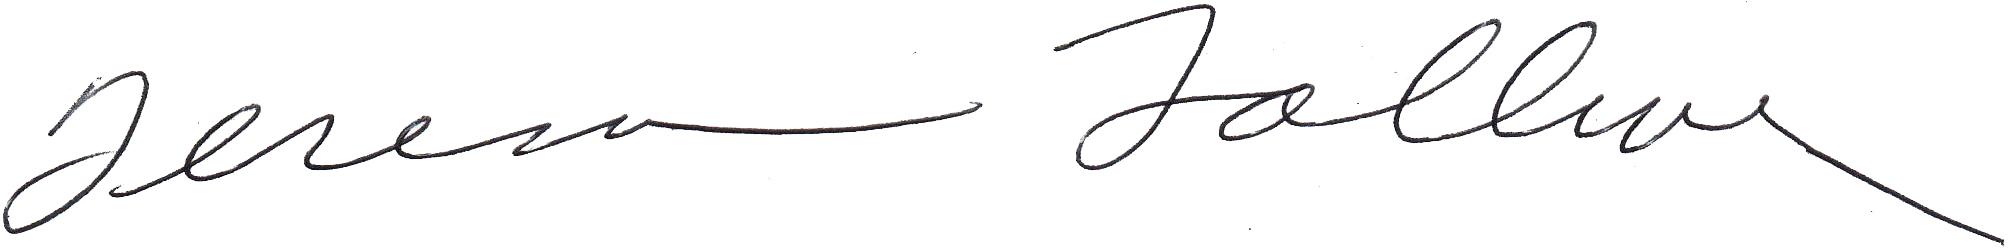 Teresa Tolliver's Signature